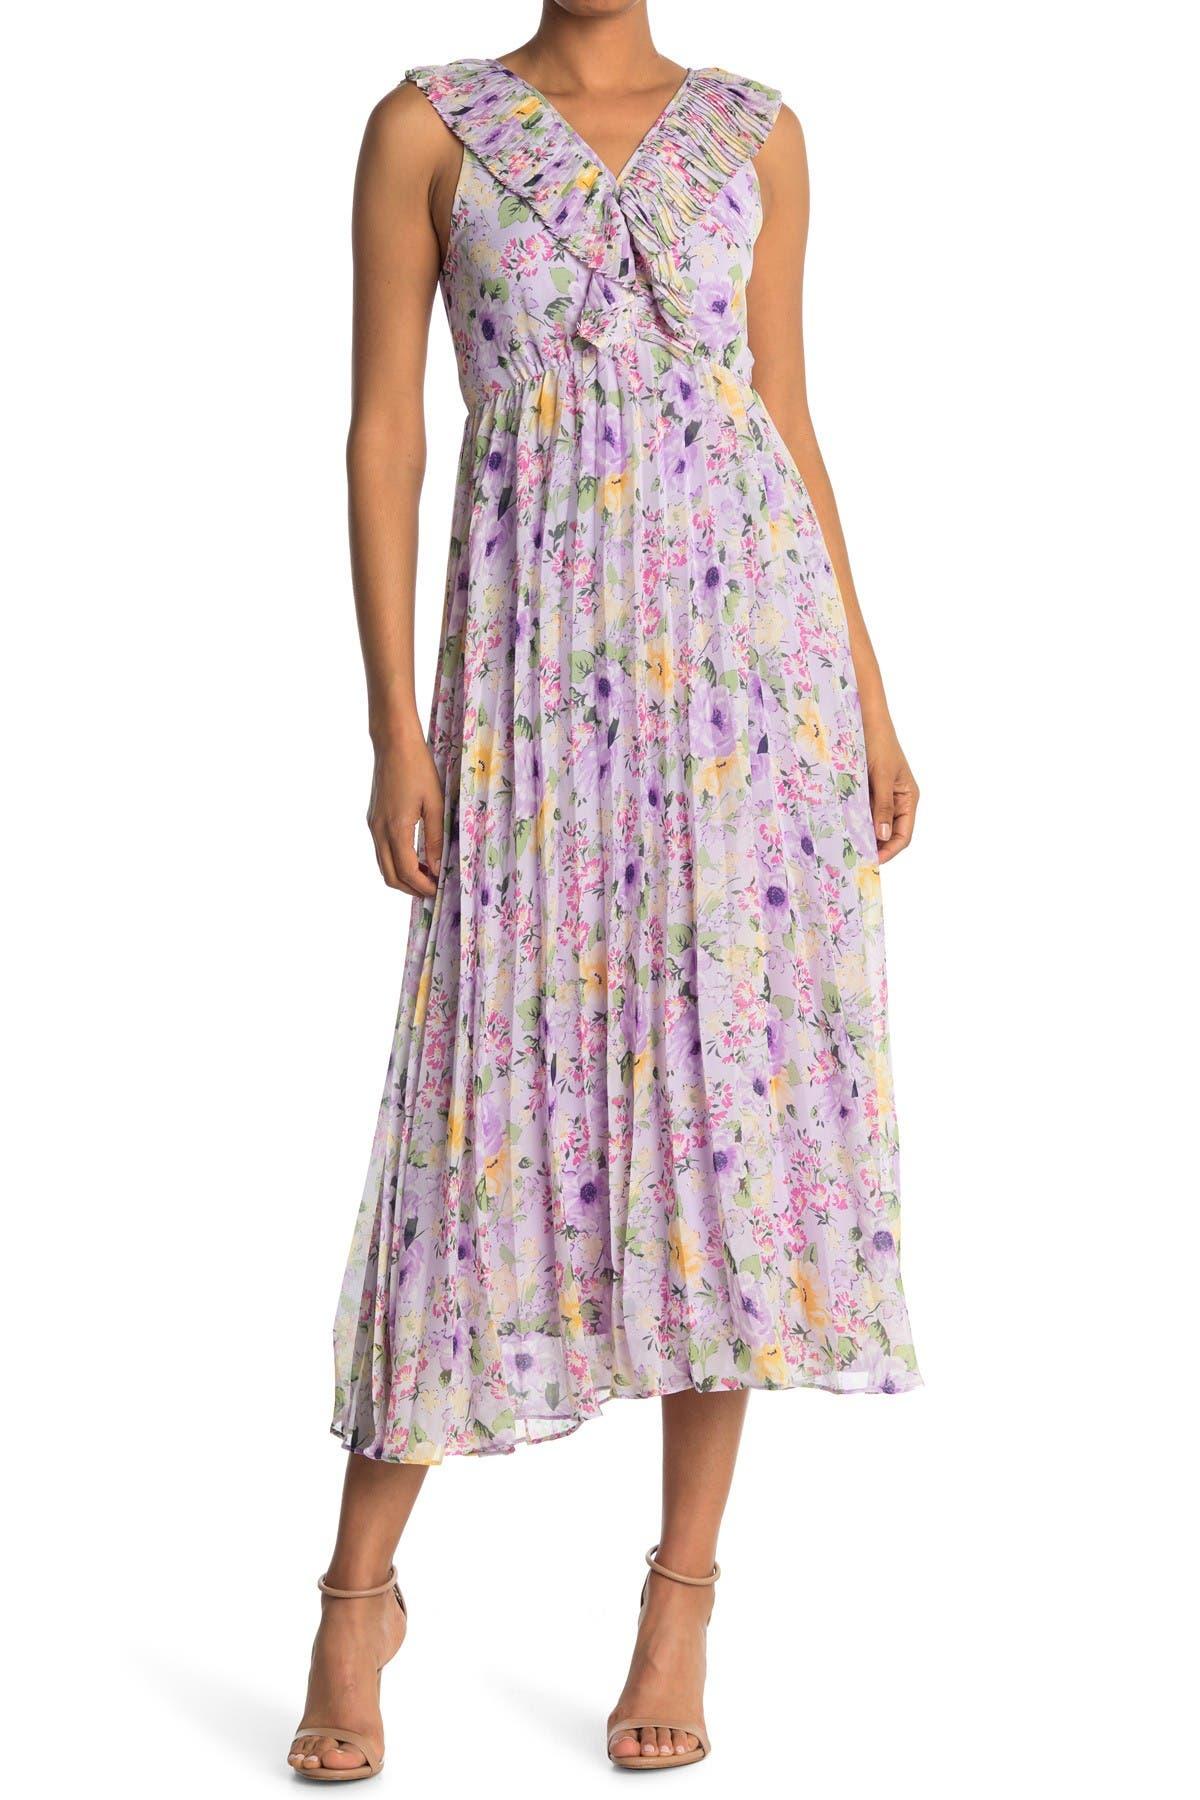 Melloday Pleated V-neck Crepe Maxi Dress In Open Purple9